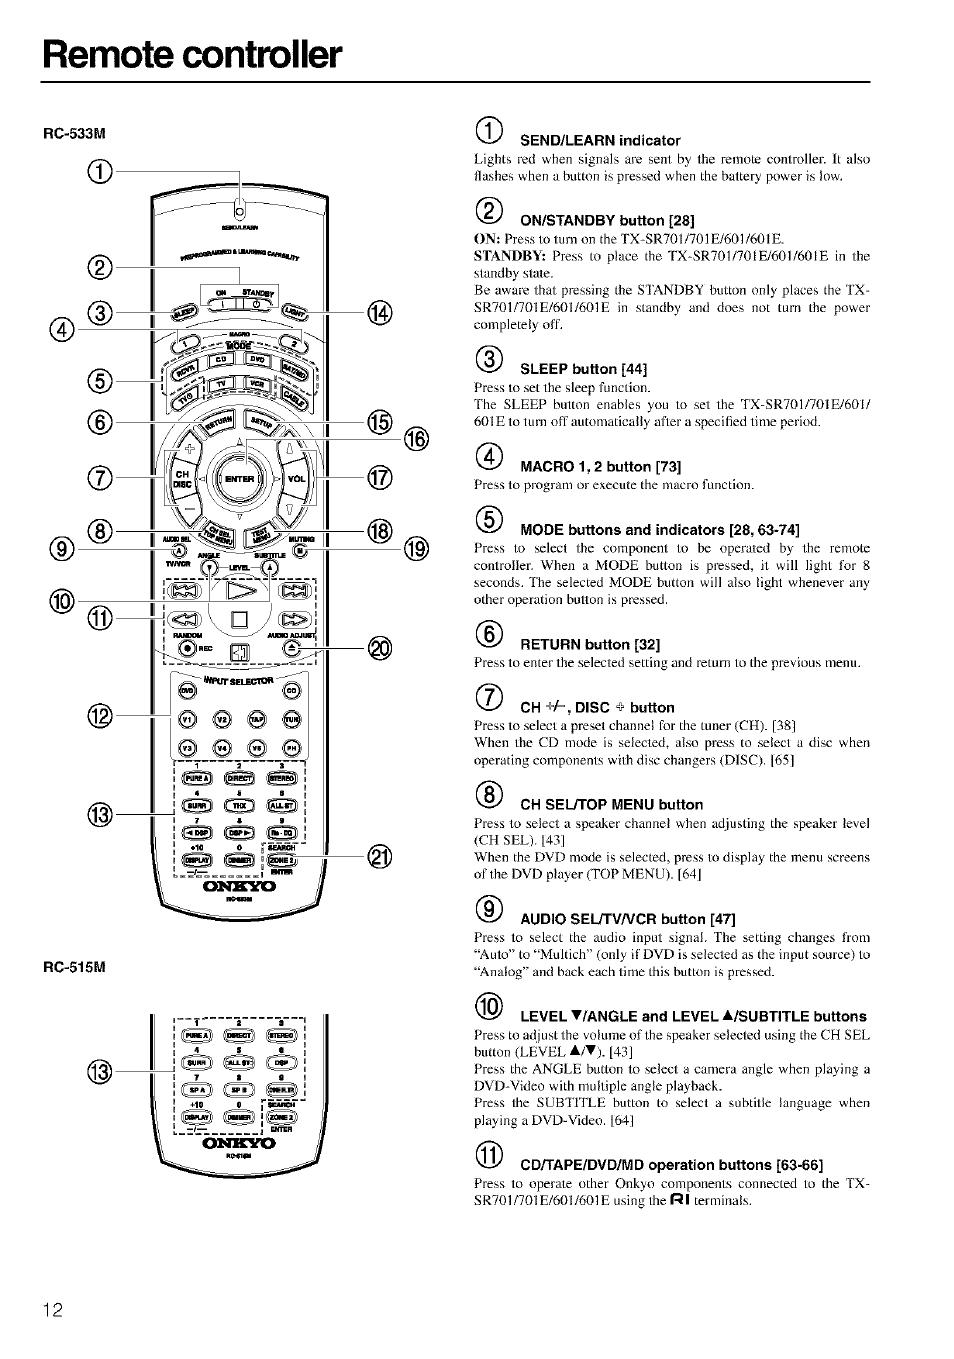 remote controller rc 533m rc 515m onkyo tx sr601 user manual rh manualsdir com Onkyo TX- SR600 onkyo tx-sr601 specs